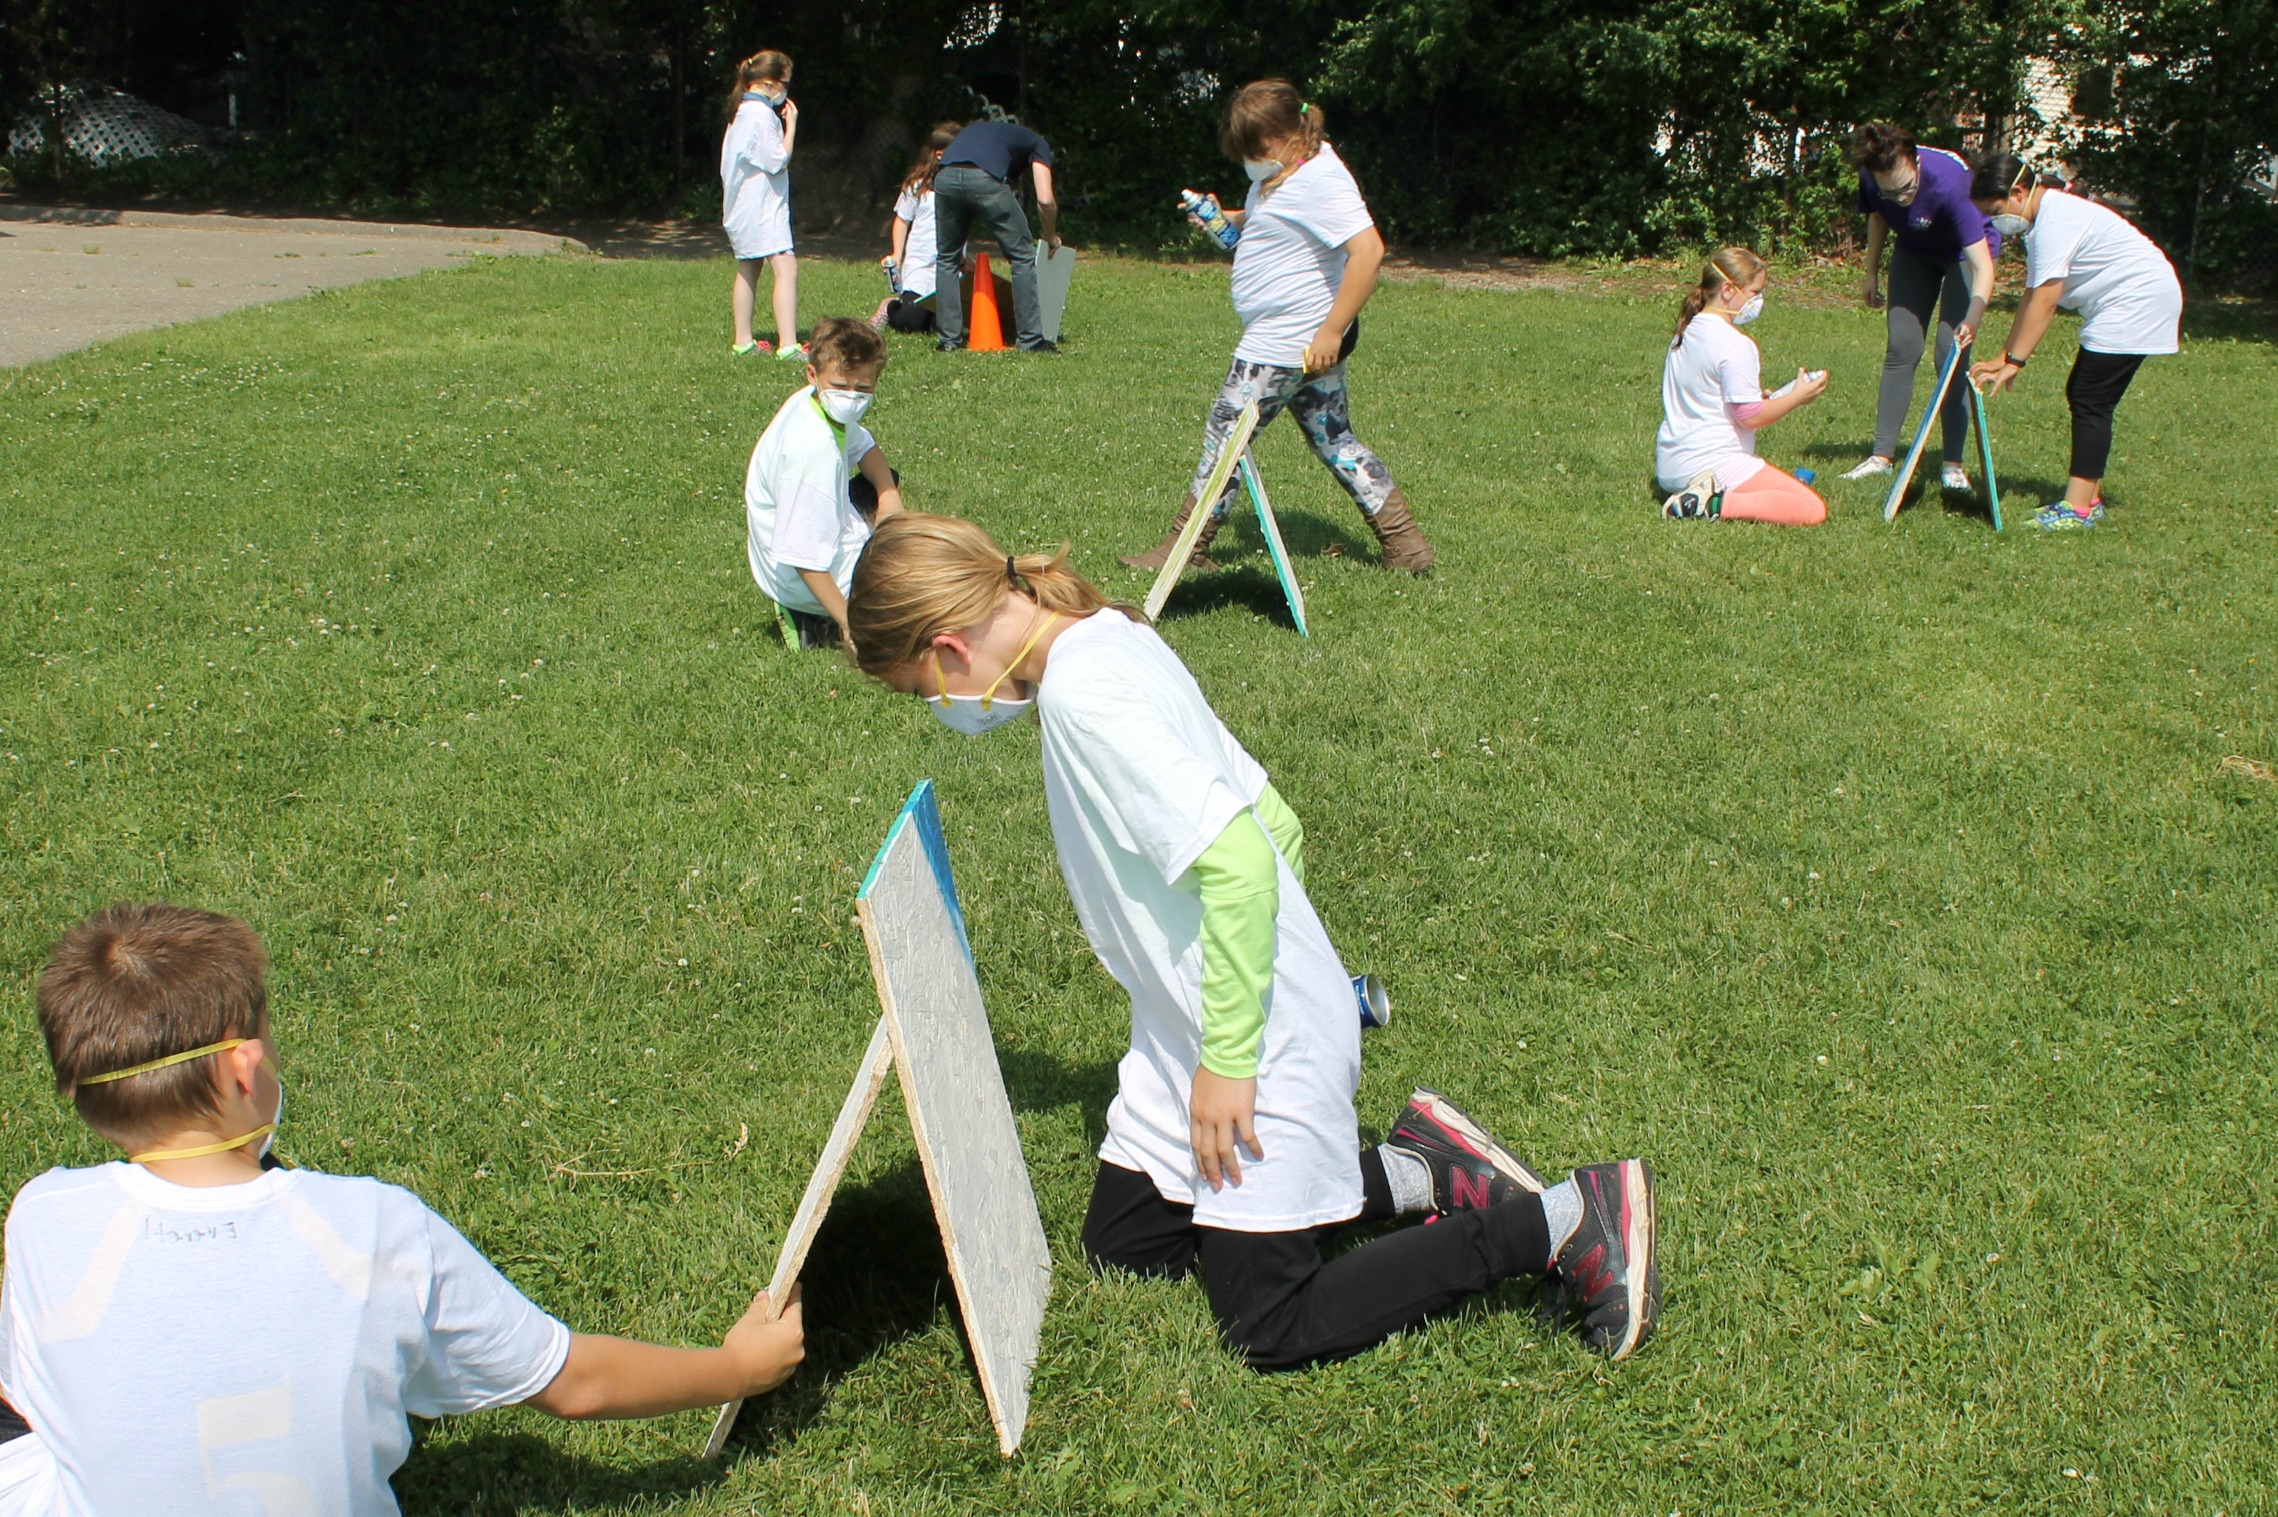 Princess Elizabeth After School Program 2015 - Spray Painting 2